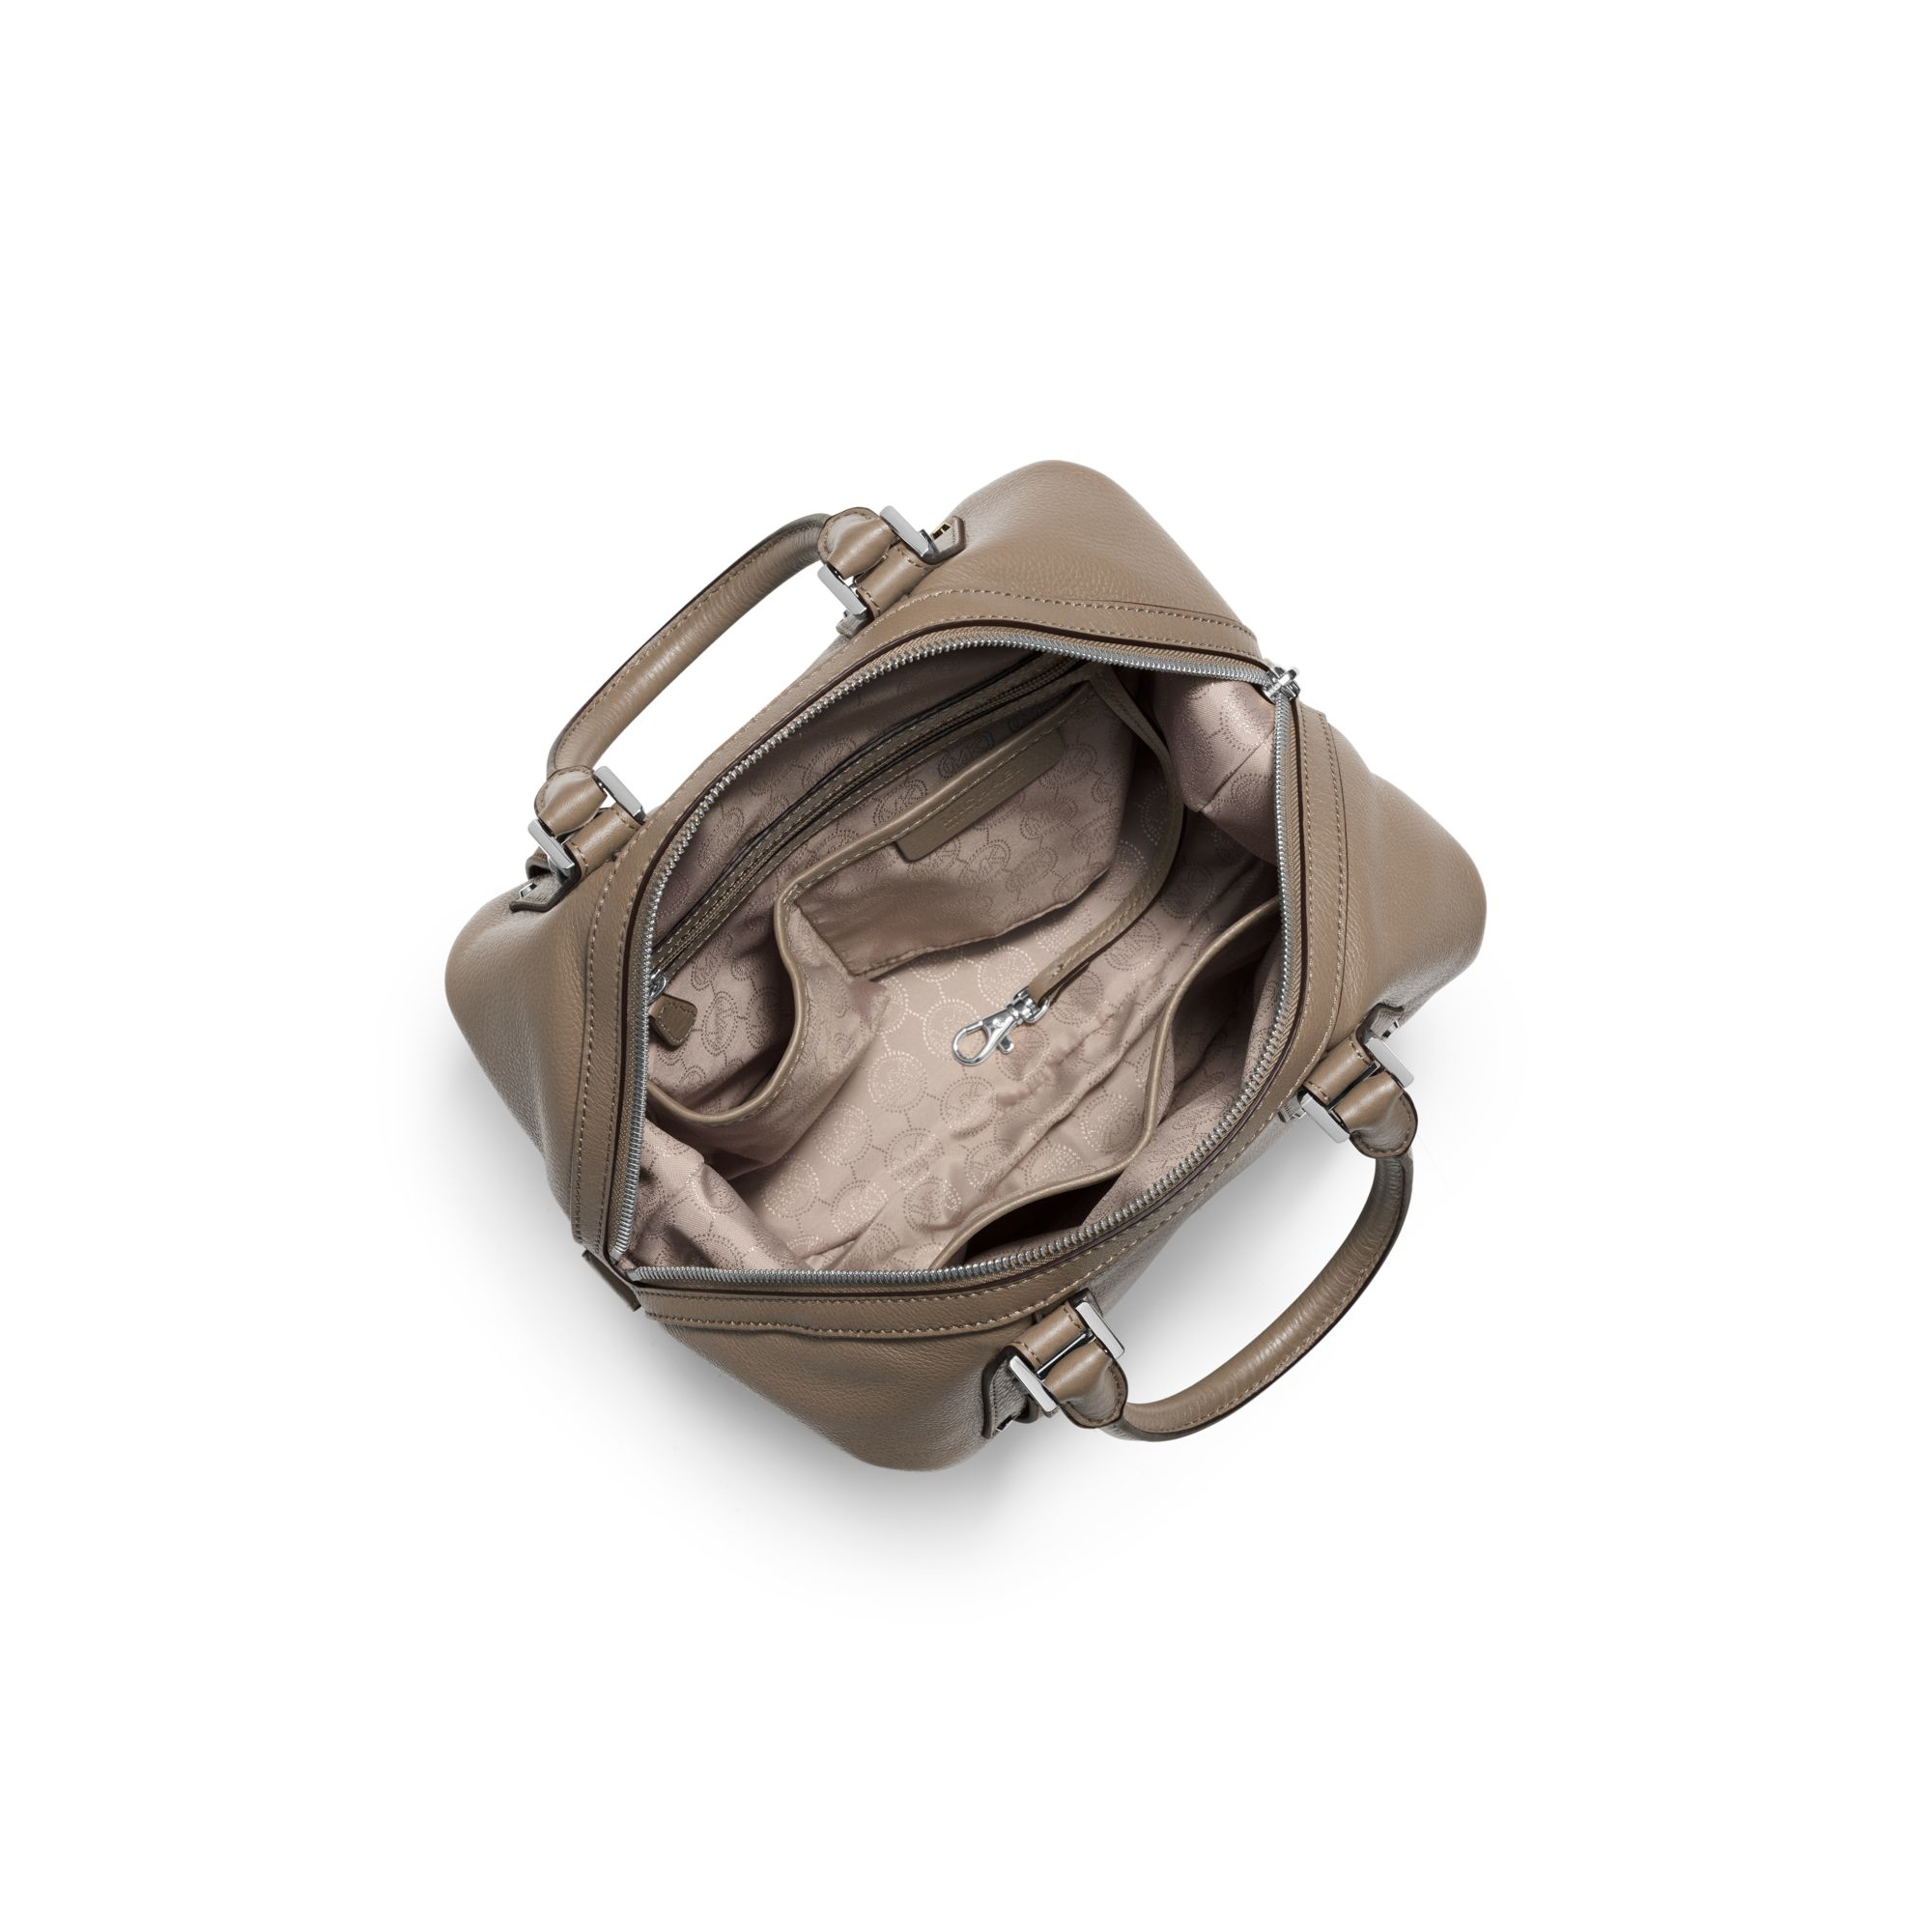 michael kors bedford medium leather satchel in brown lyst. Black Bedroom Furniture Sets. Home Design Ideas